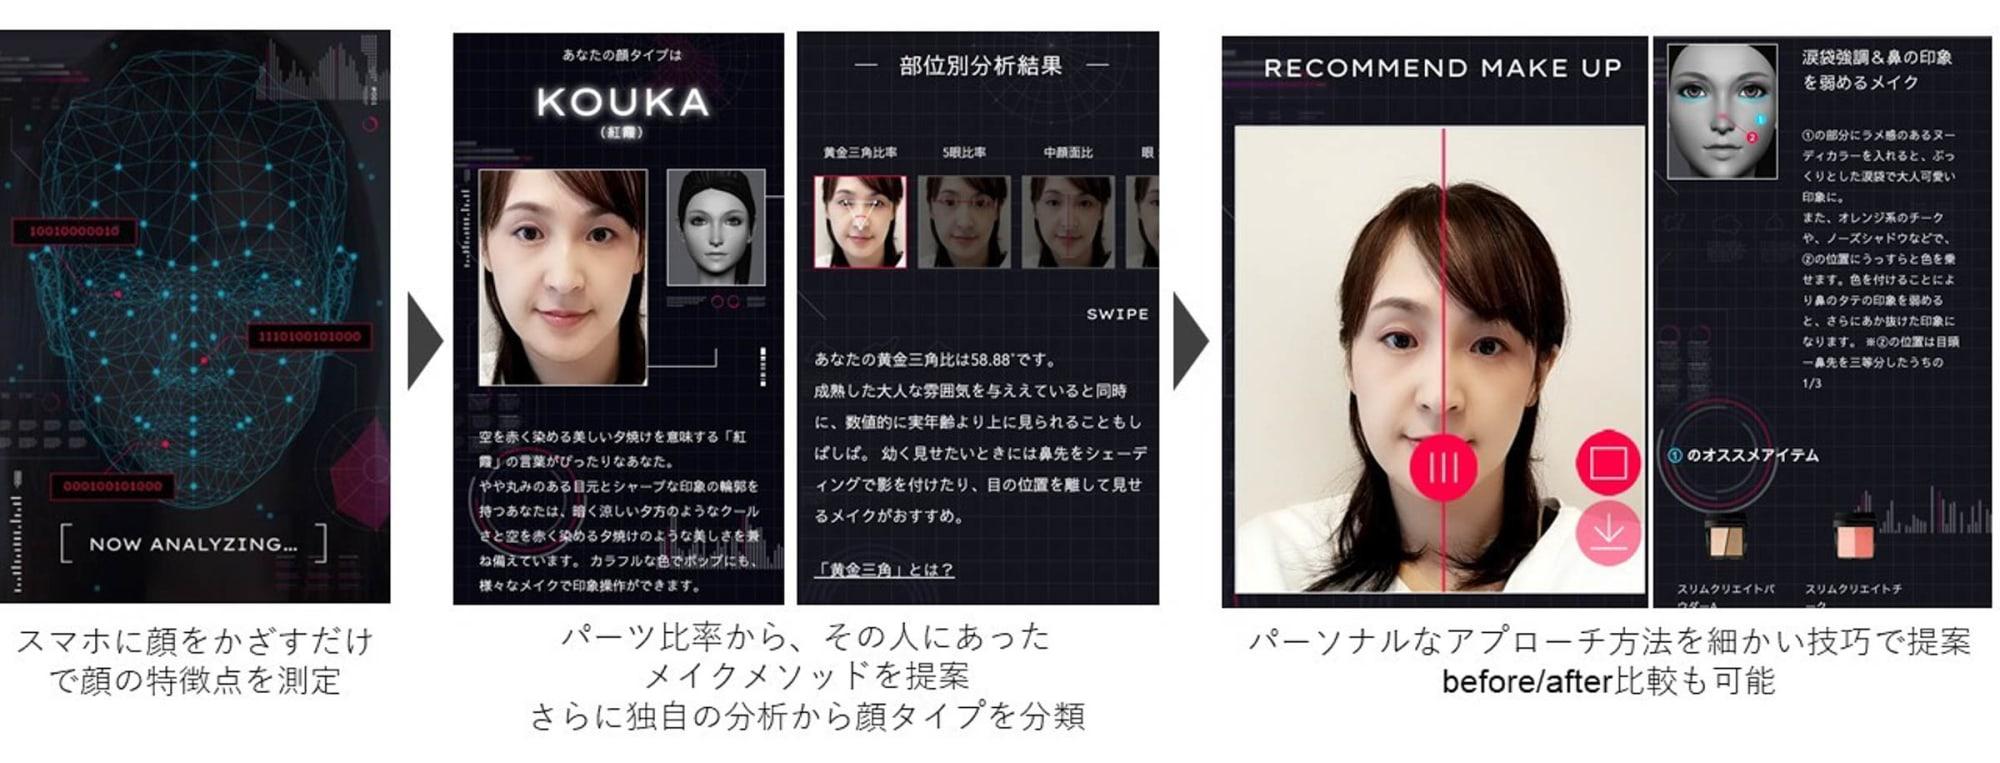 Kate 顔 診断 「KATE」が顔タイプの診断サービスを開始、似合うメイクを提案:マピ...